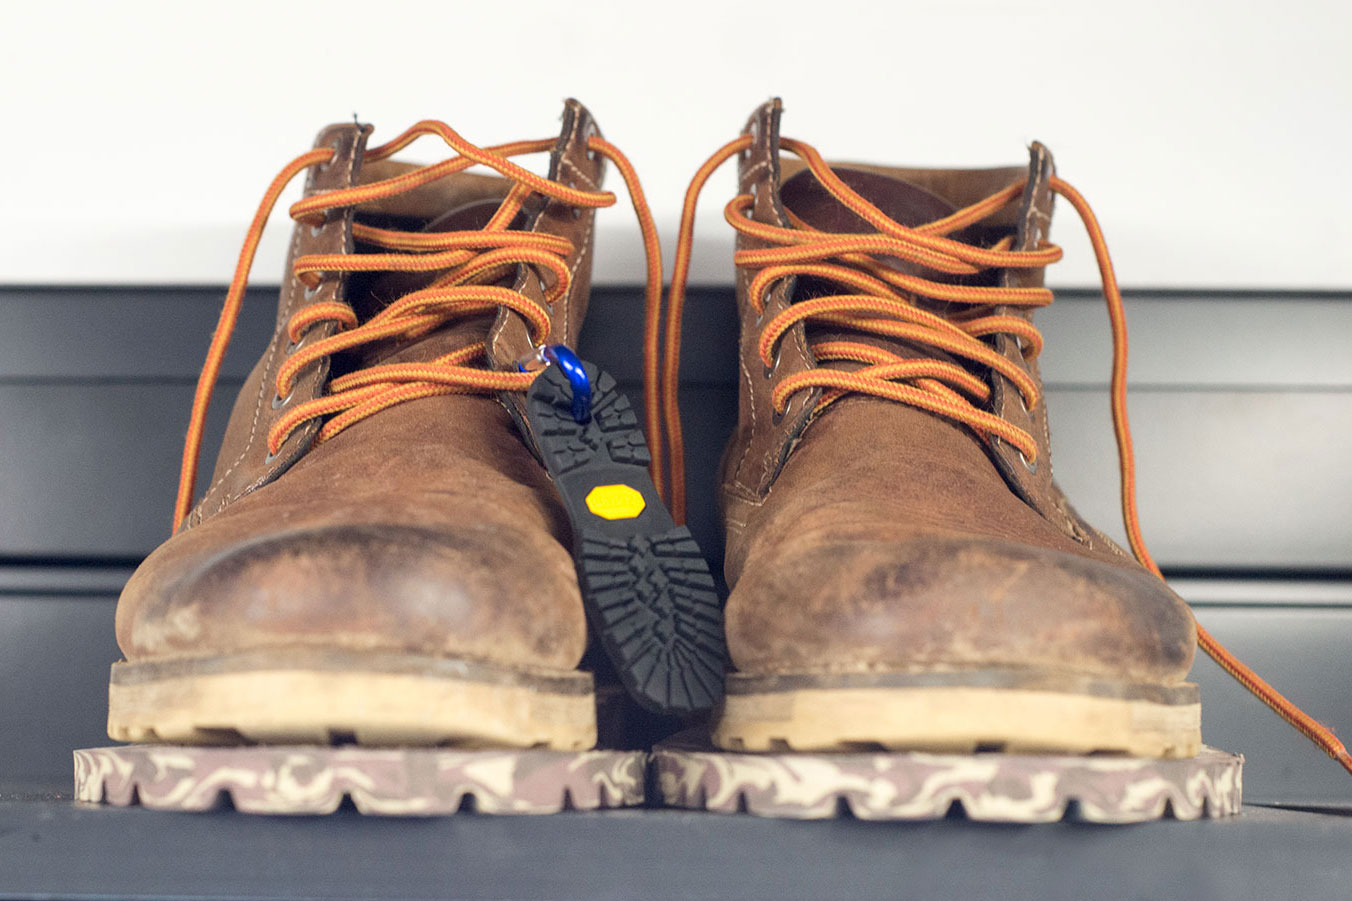 e4b0e9188c2 Vibram's Sole Factor Tour Gives Your Shoes A Second Chance | Expeds